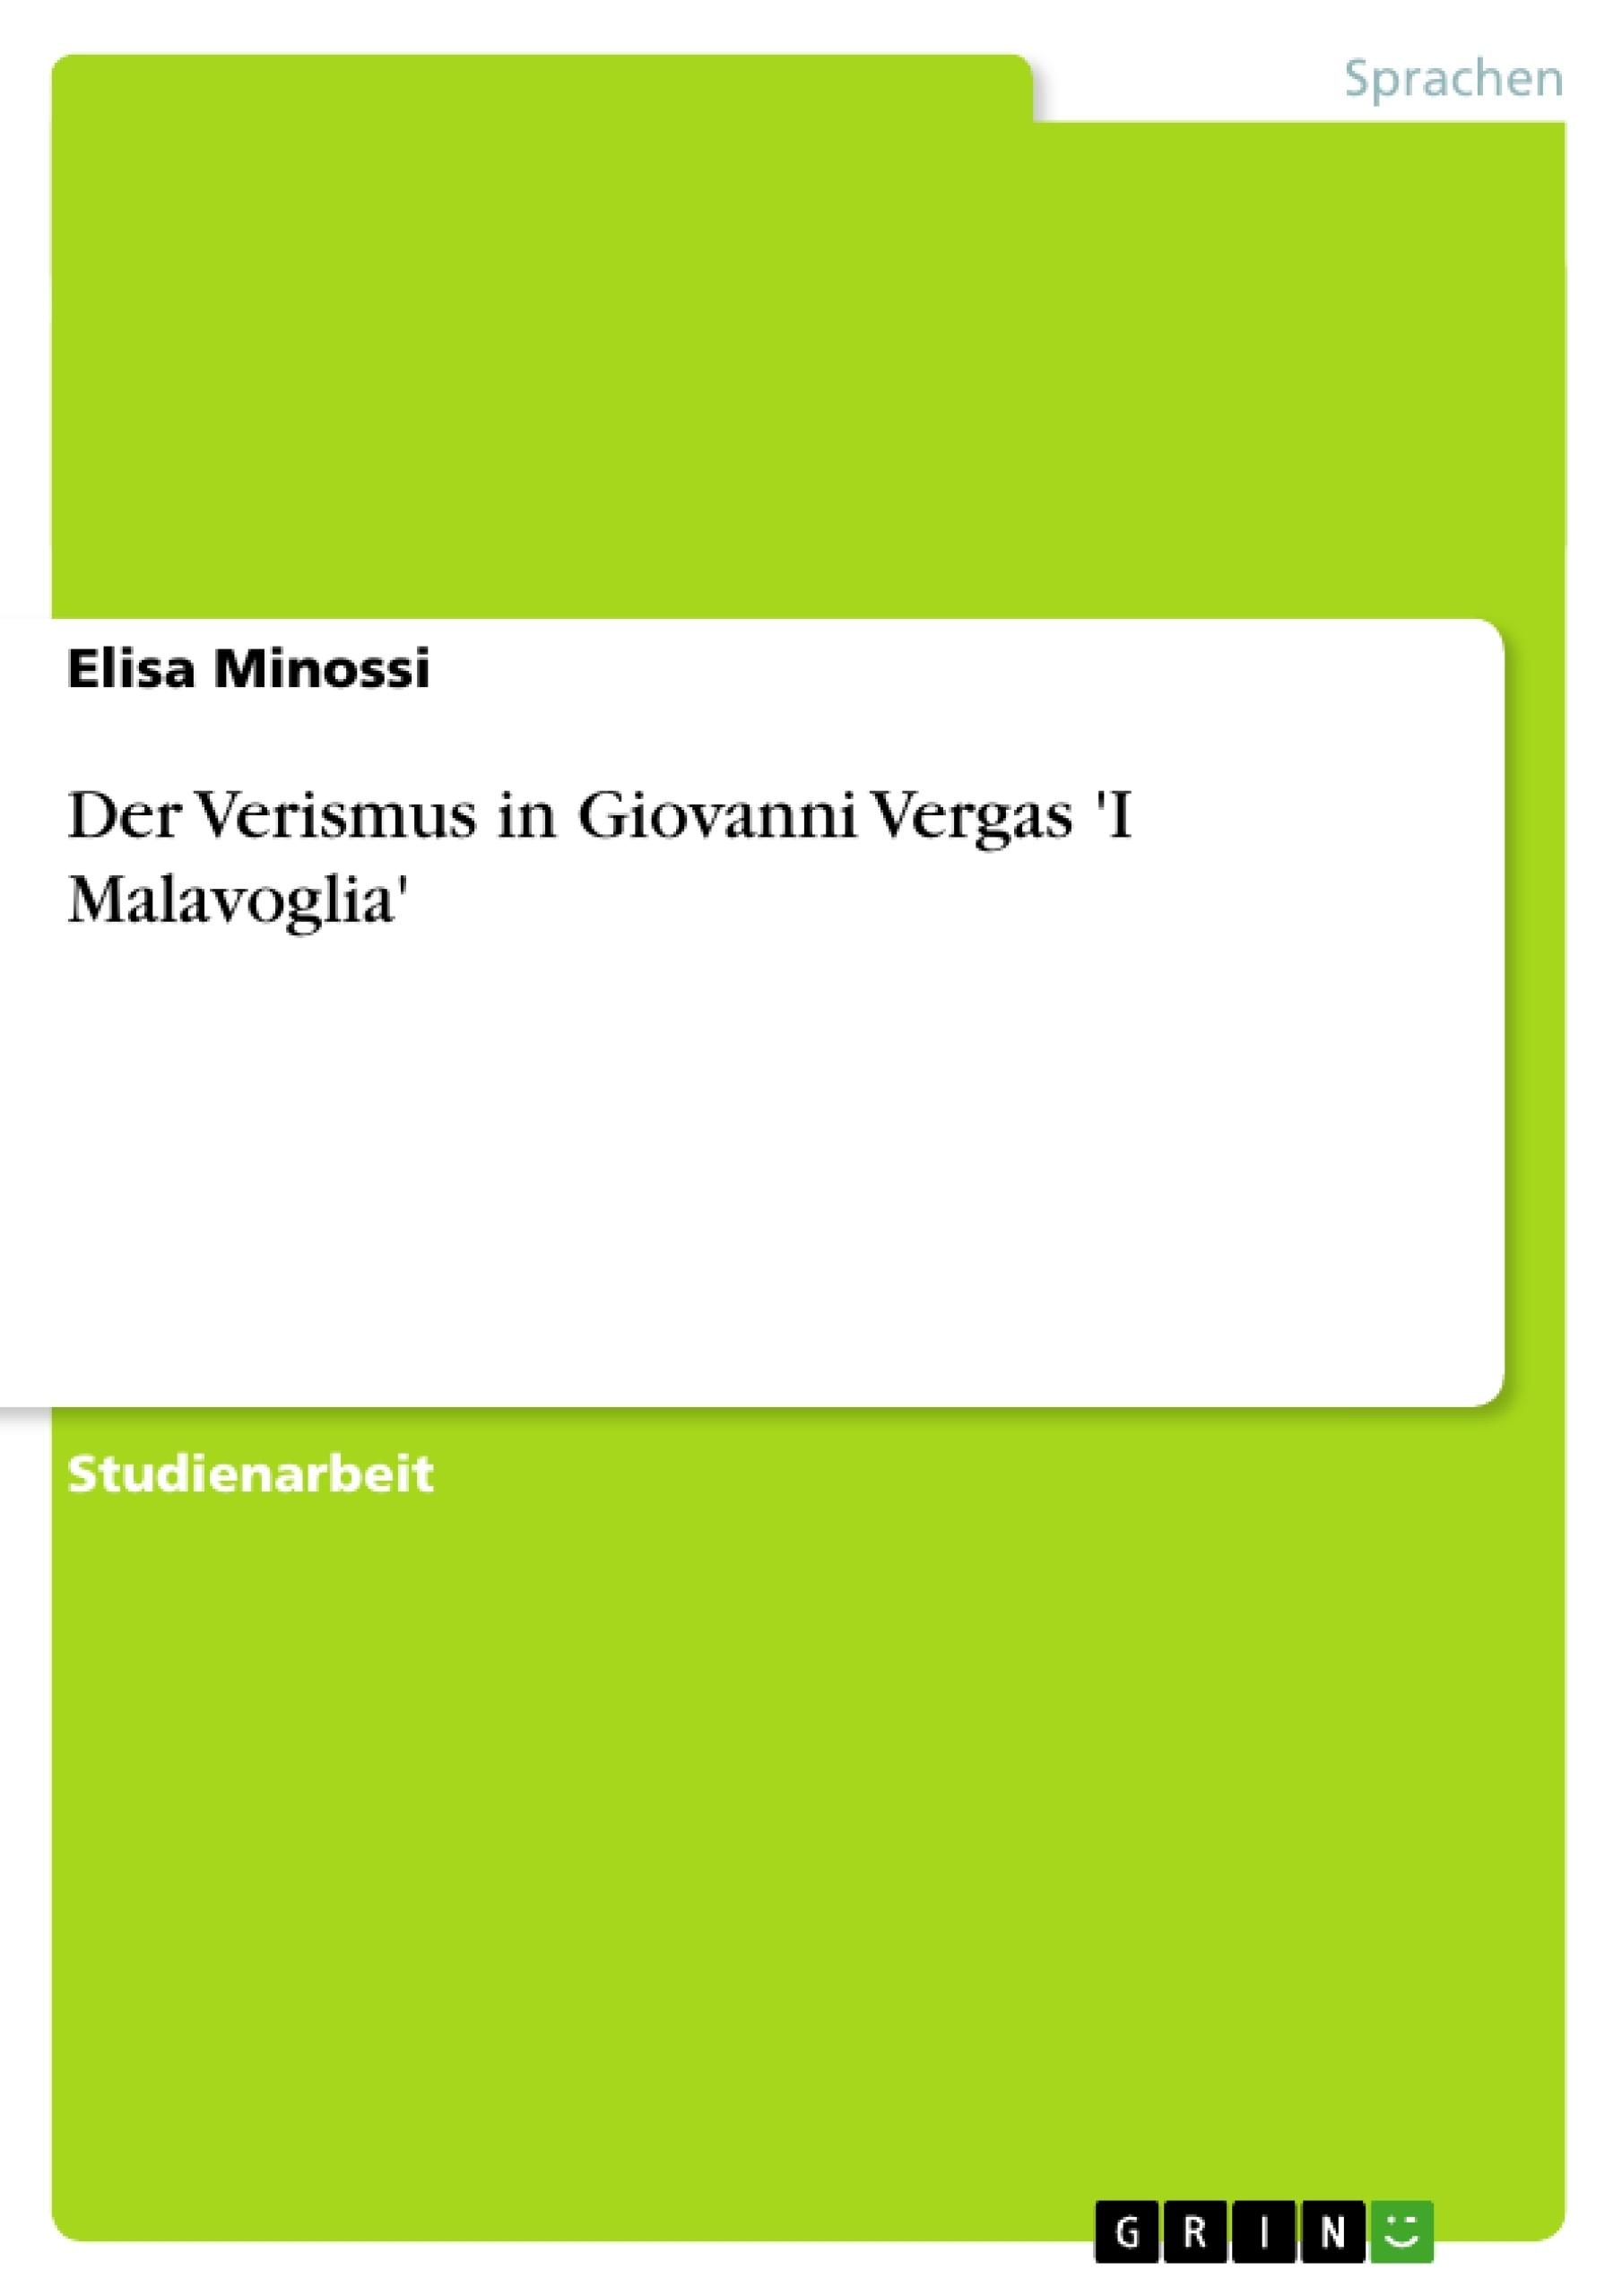 Titel: Der Verismus in  Giovanni Vergas  'I Malavoglia'